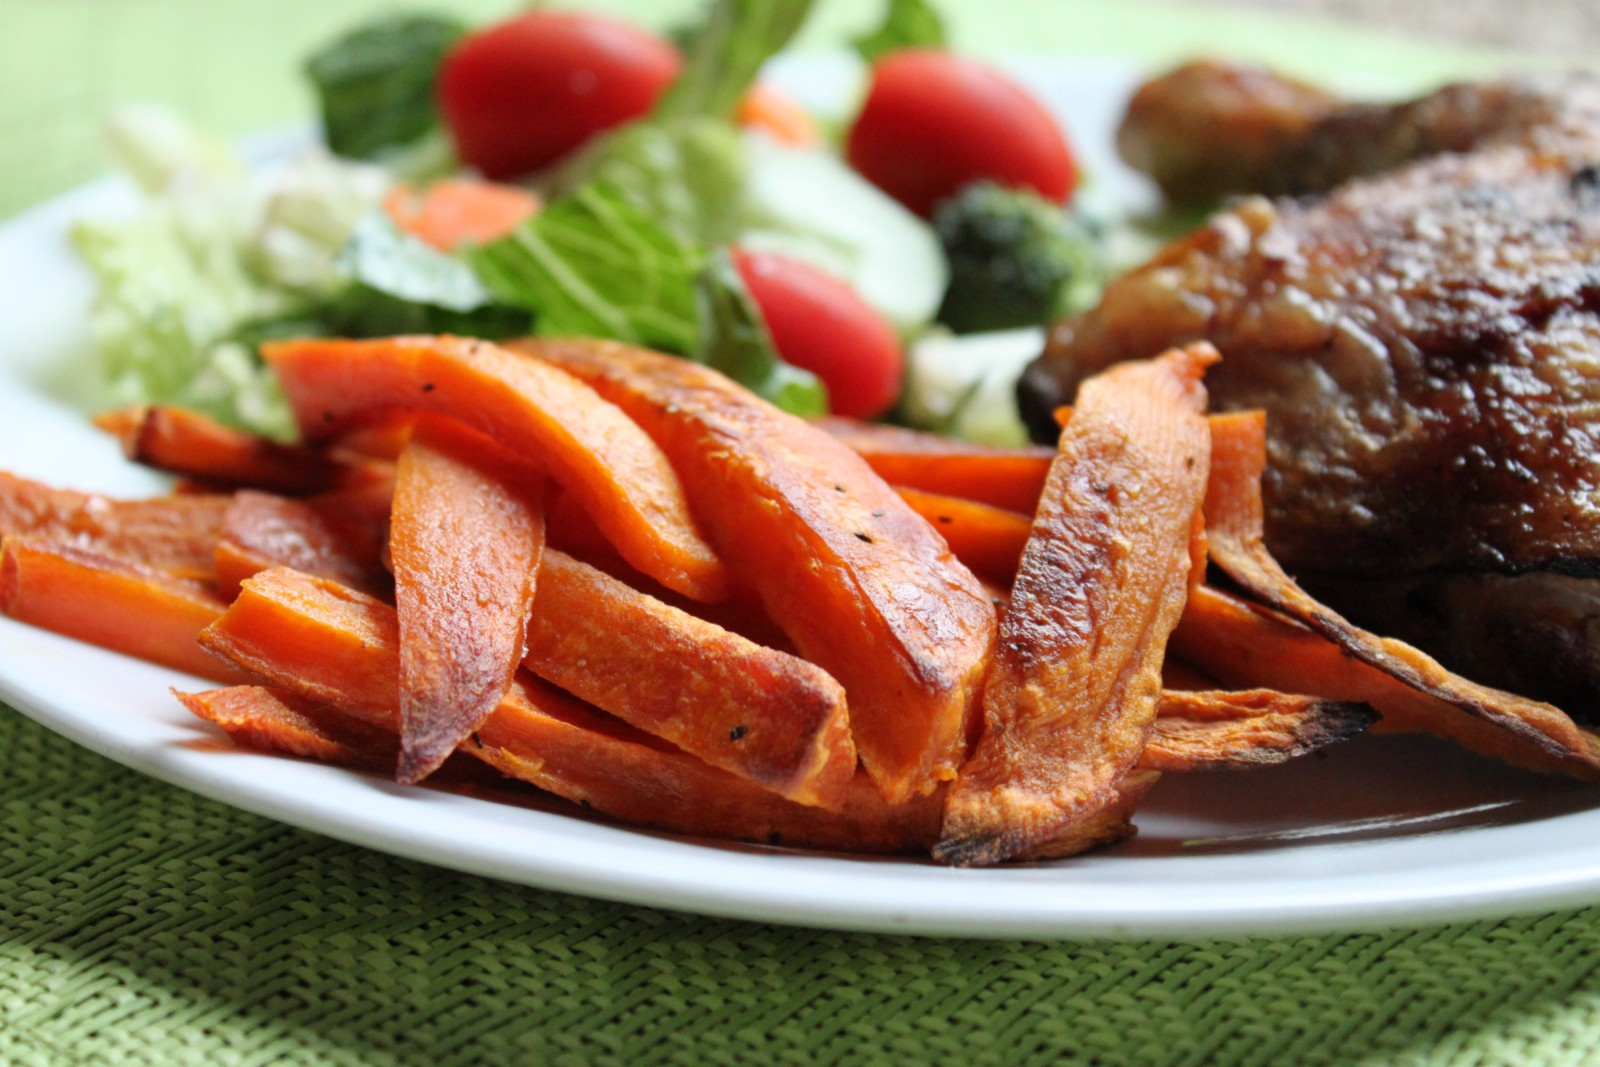 How has eating Paleo/Primal/GAPS/Grain-free helped you?